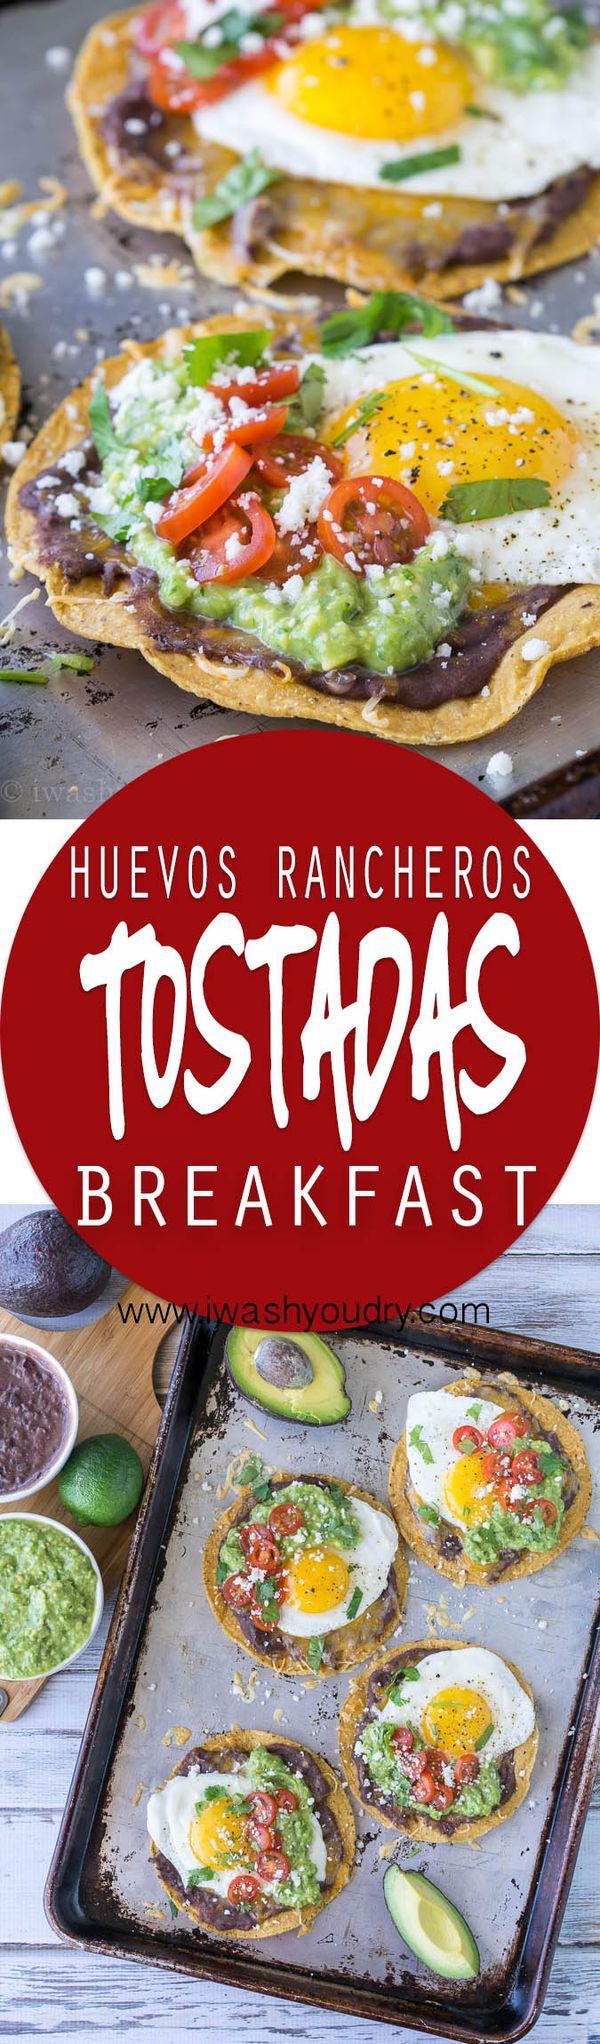 Huevos Rancheros Breakfast Tostadas with Avocado Salsa Verde